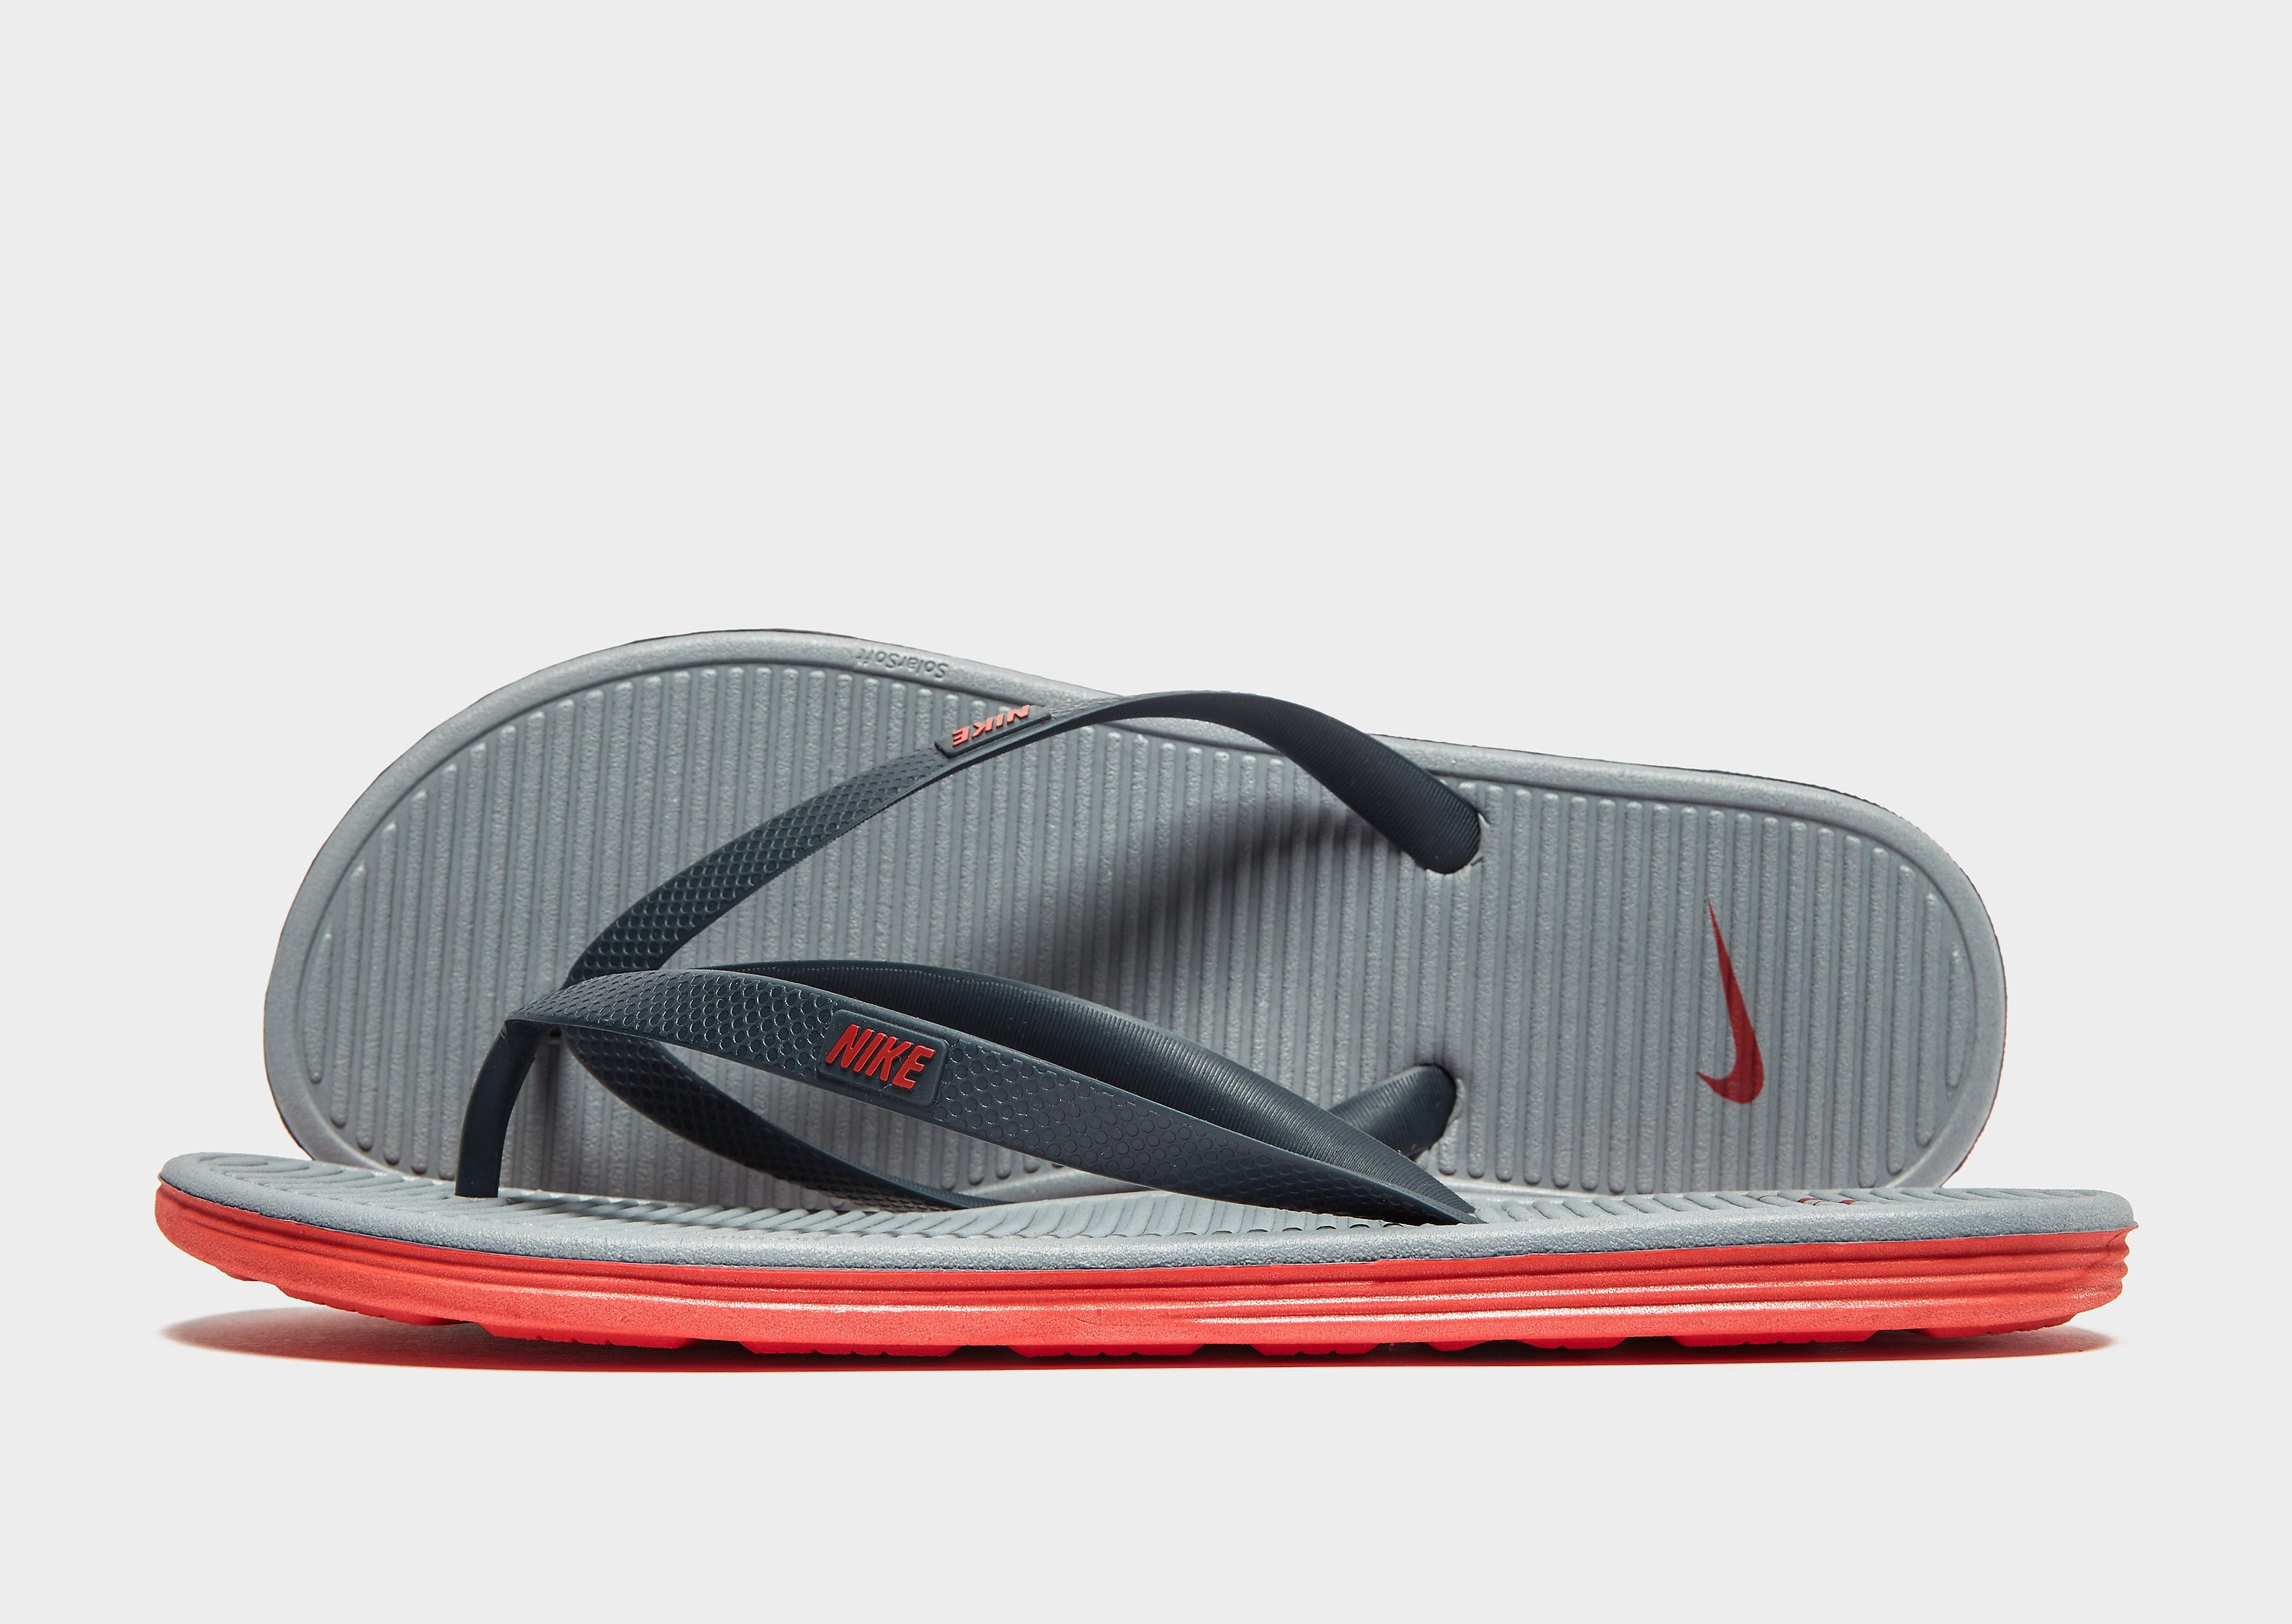 Nike Solarsoft II Flip Flops - Charcoal Grey/ Challenge Red - Mens, Charcoal Grey/ Challenge Red